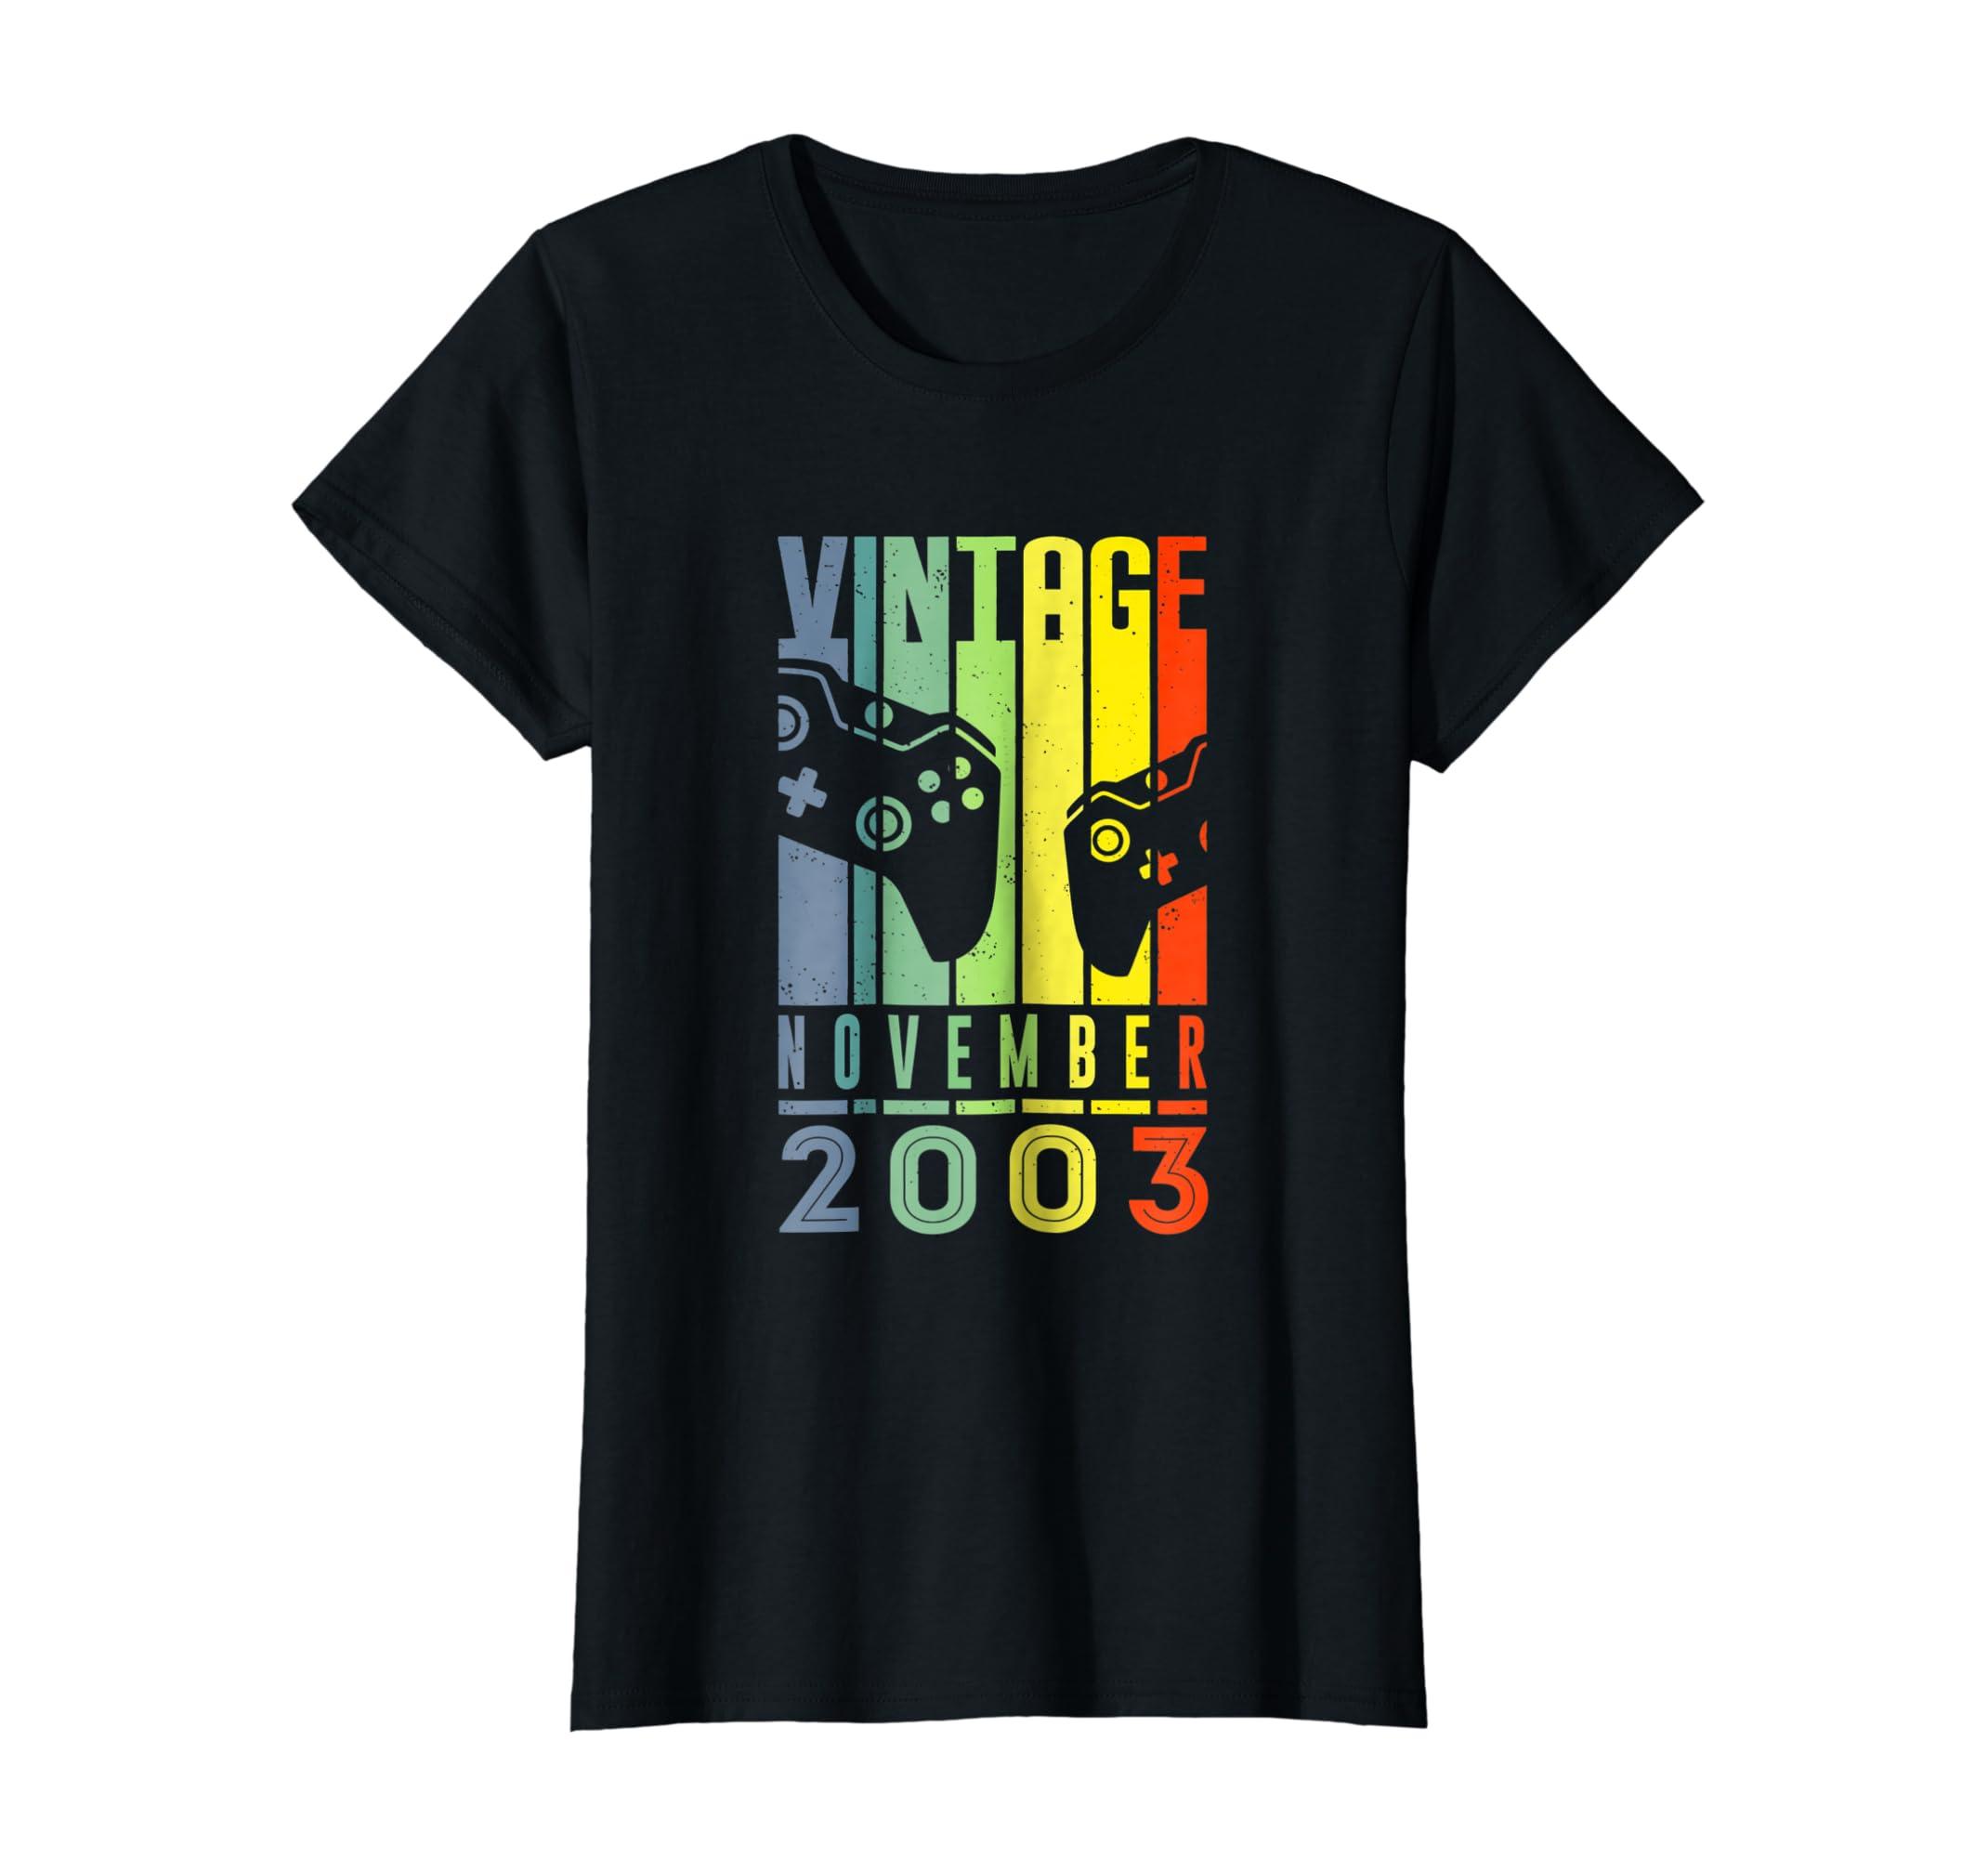 Amazon November 2003 T Shirt Funny Video Gamer 15th Birthday Gift Clothing